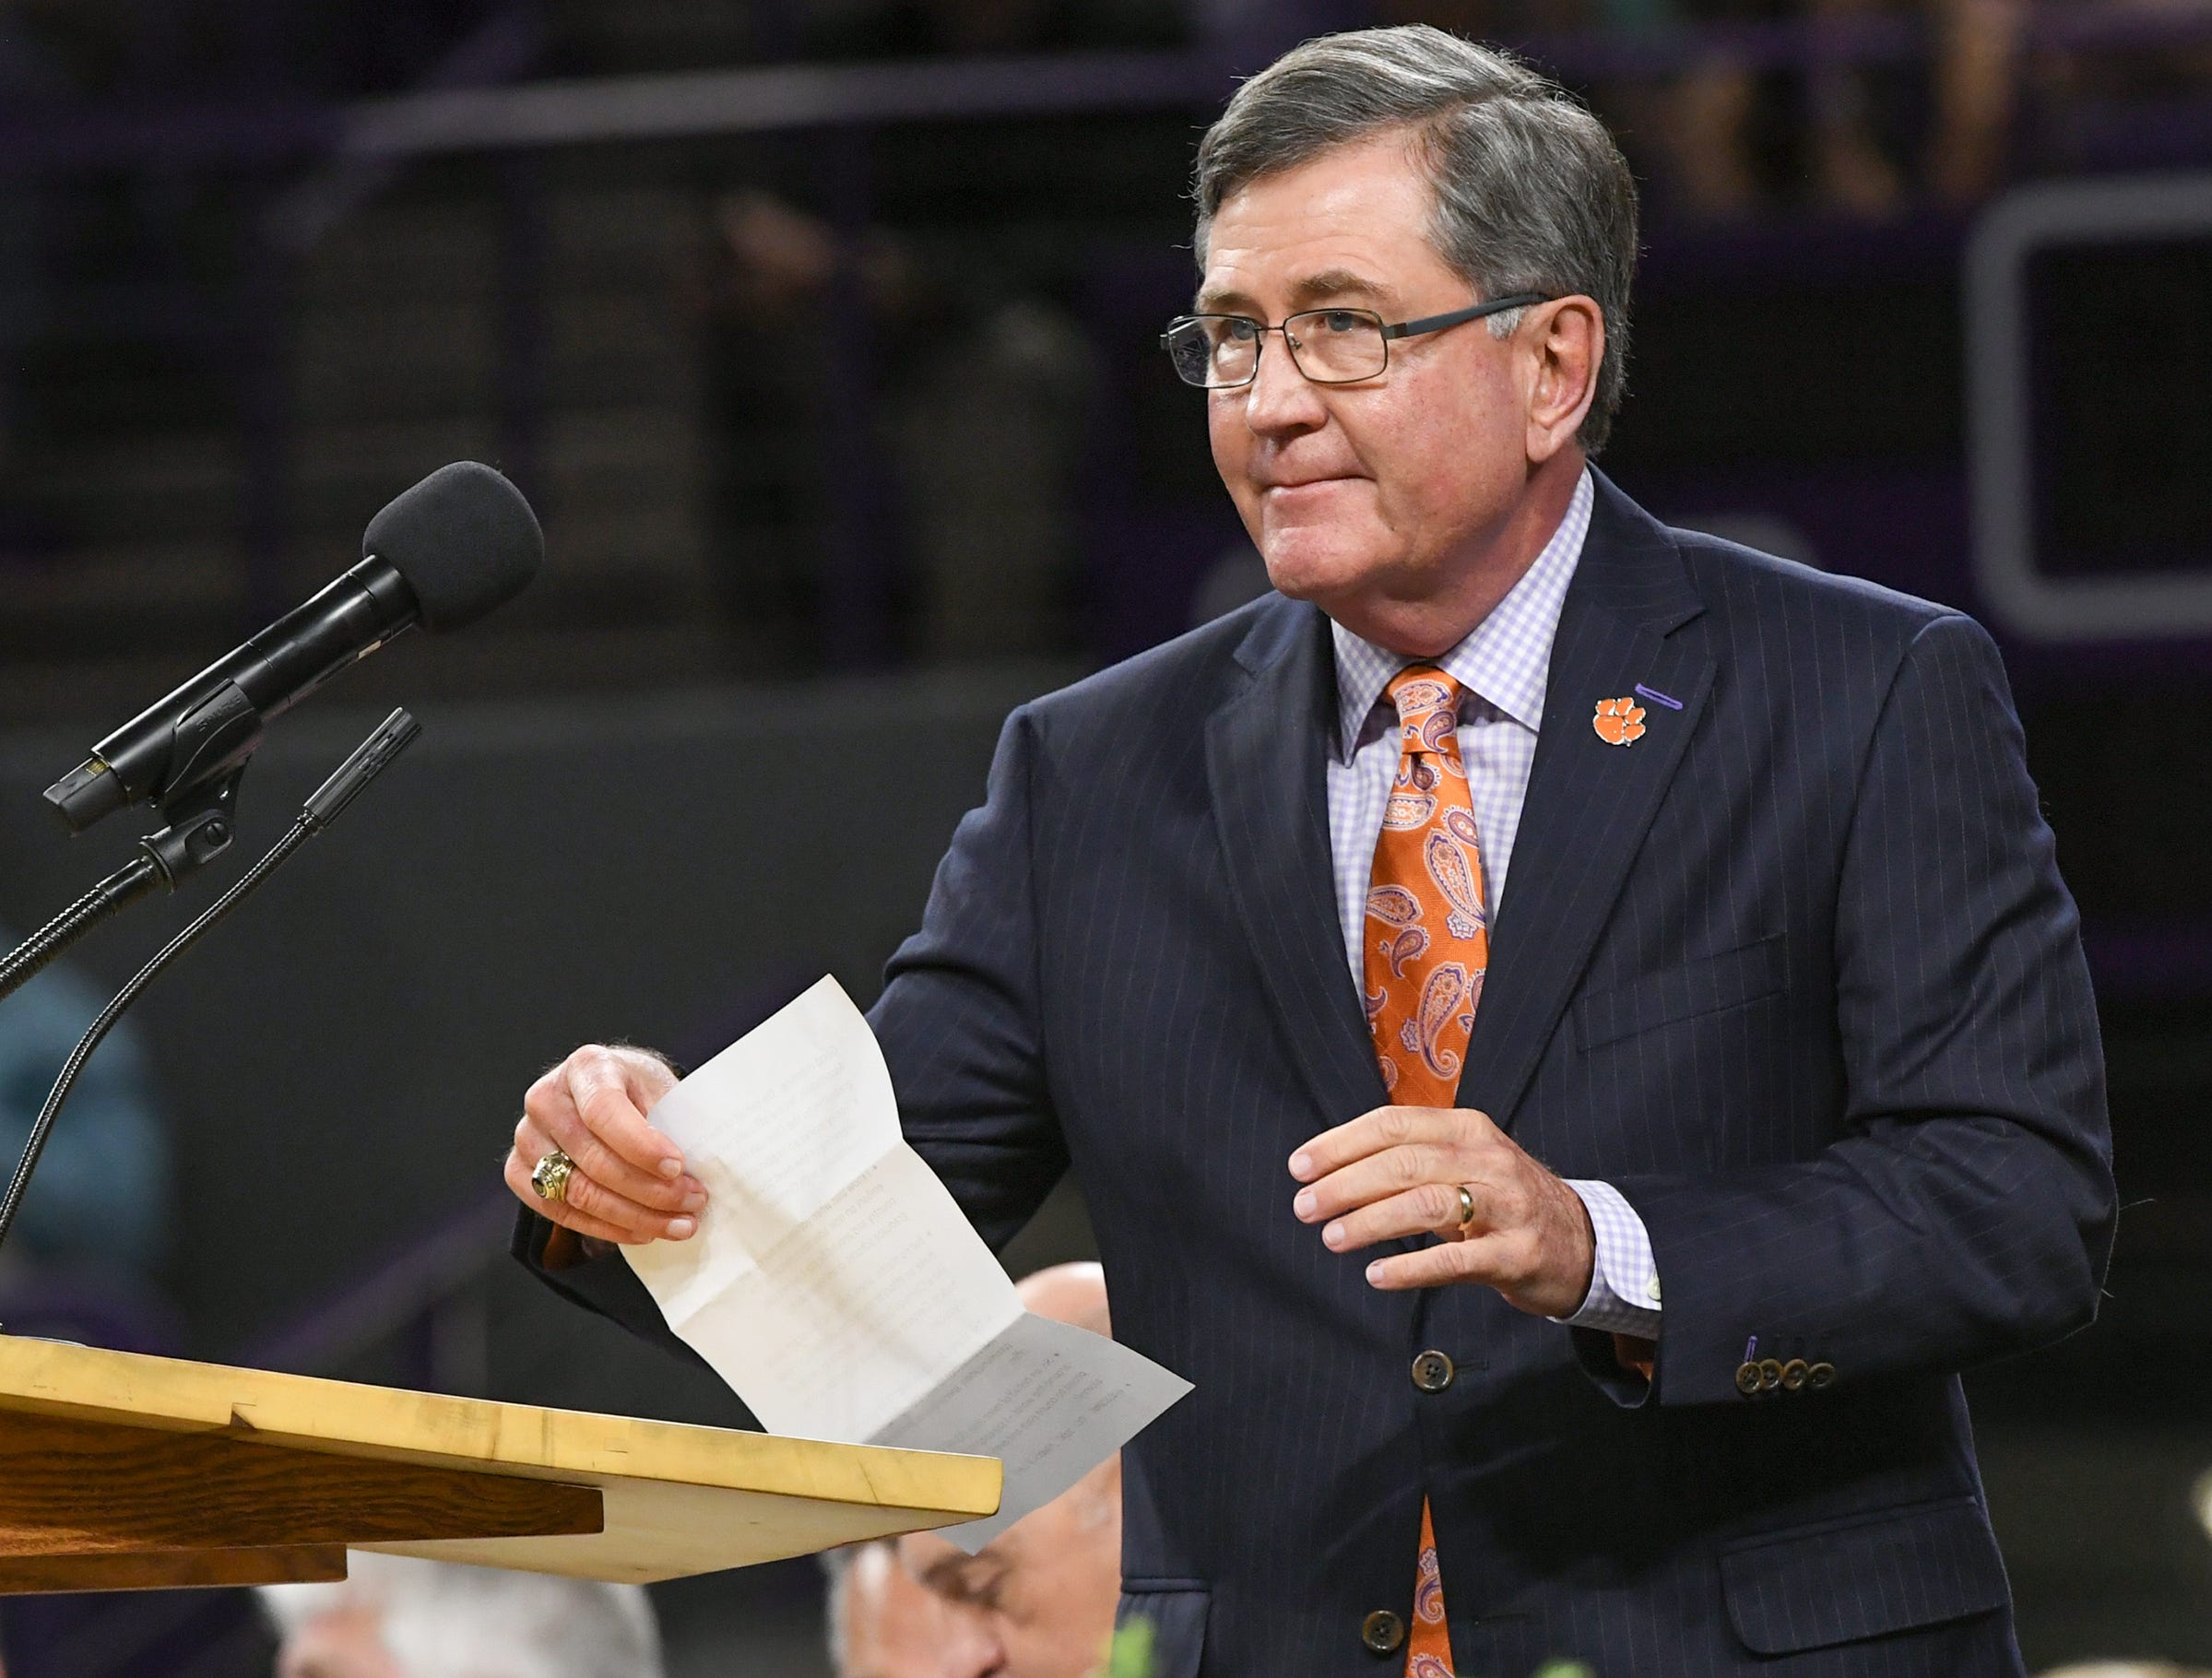 Gregg Morton of Clemson, on the Clemson Alumni Association board, talks to students during Clemson University commencement ceremonies in Littlejohn Coliseum in Clemson Friday, May 10, 2019.